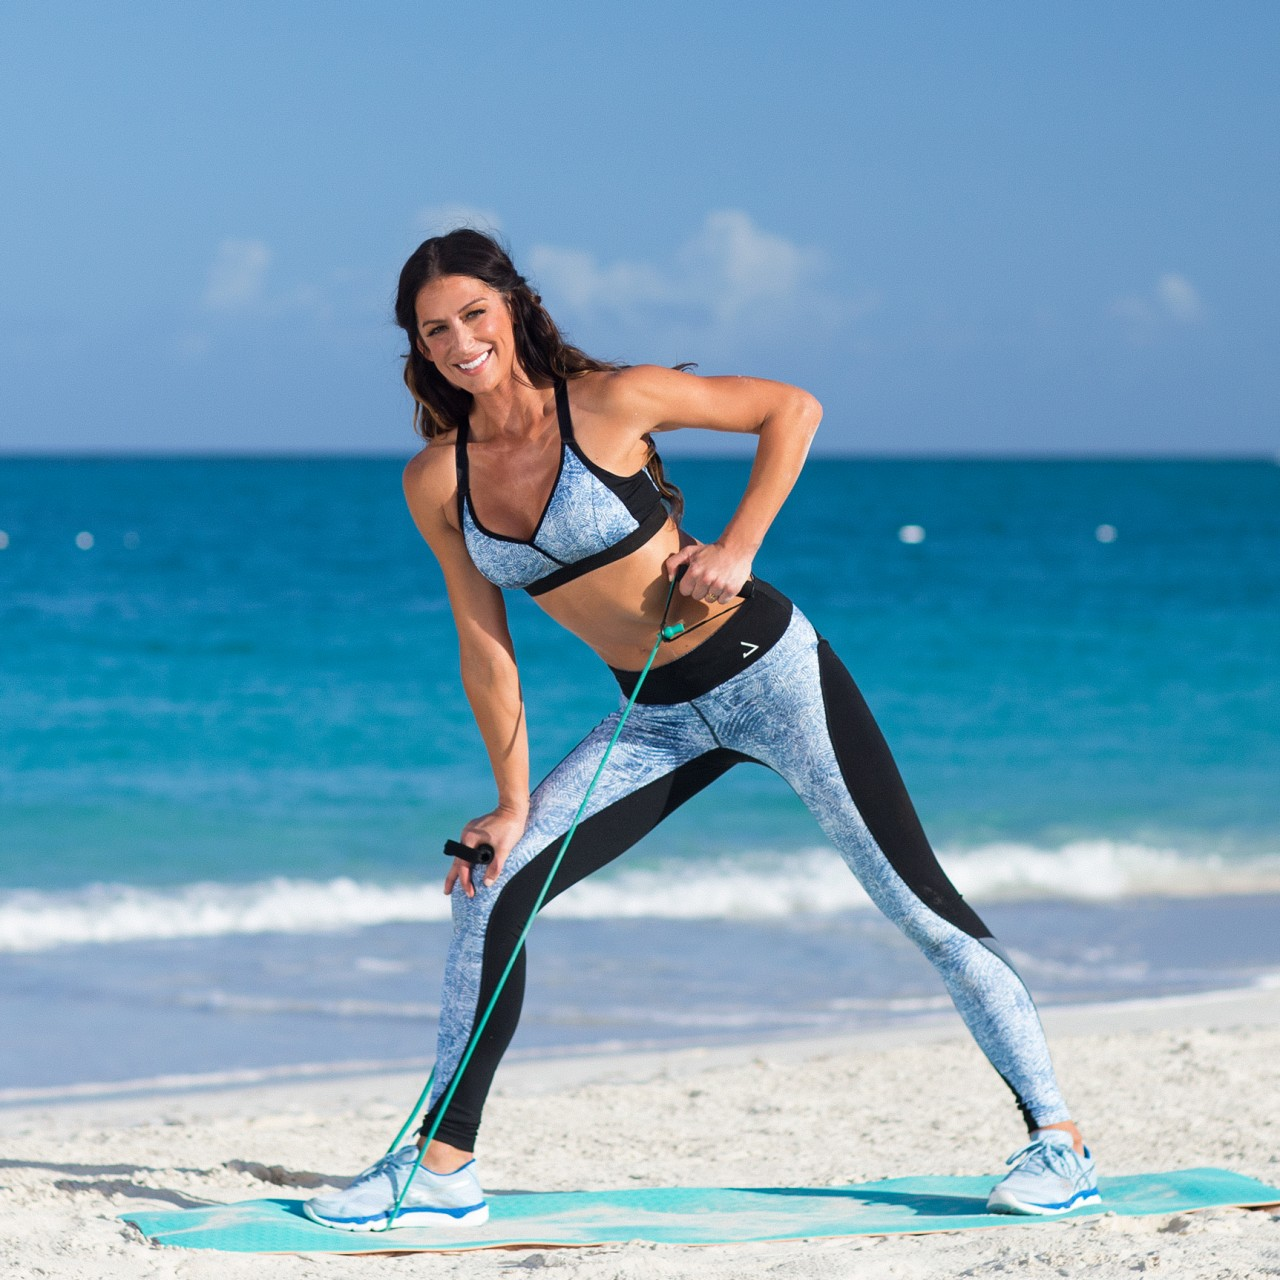 karena-workout-beach-bikini-series-